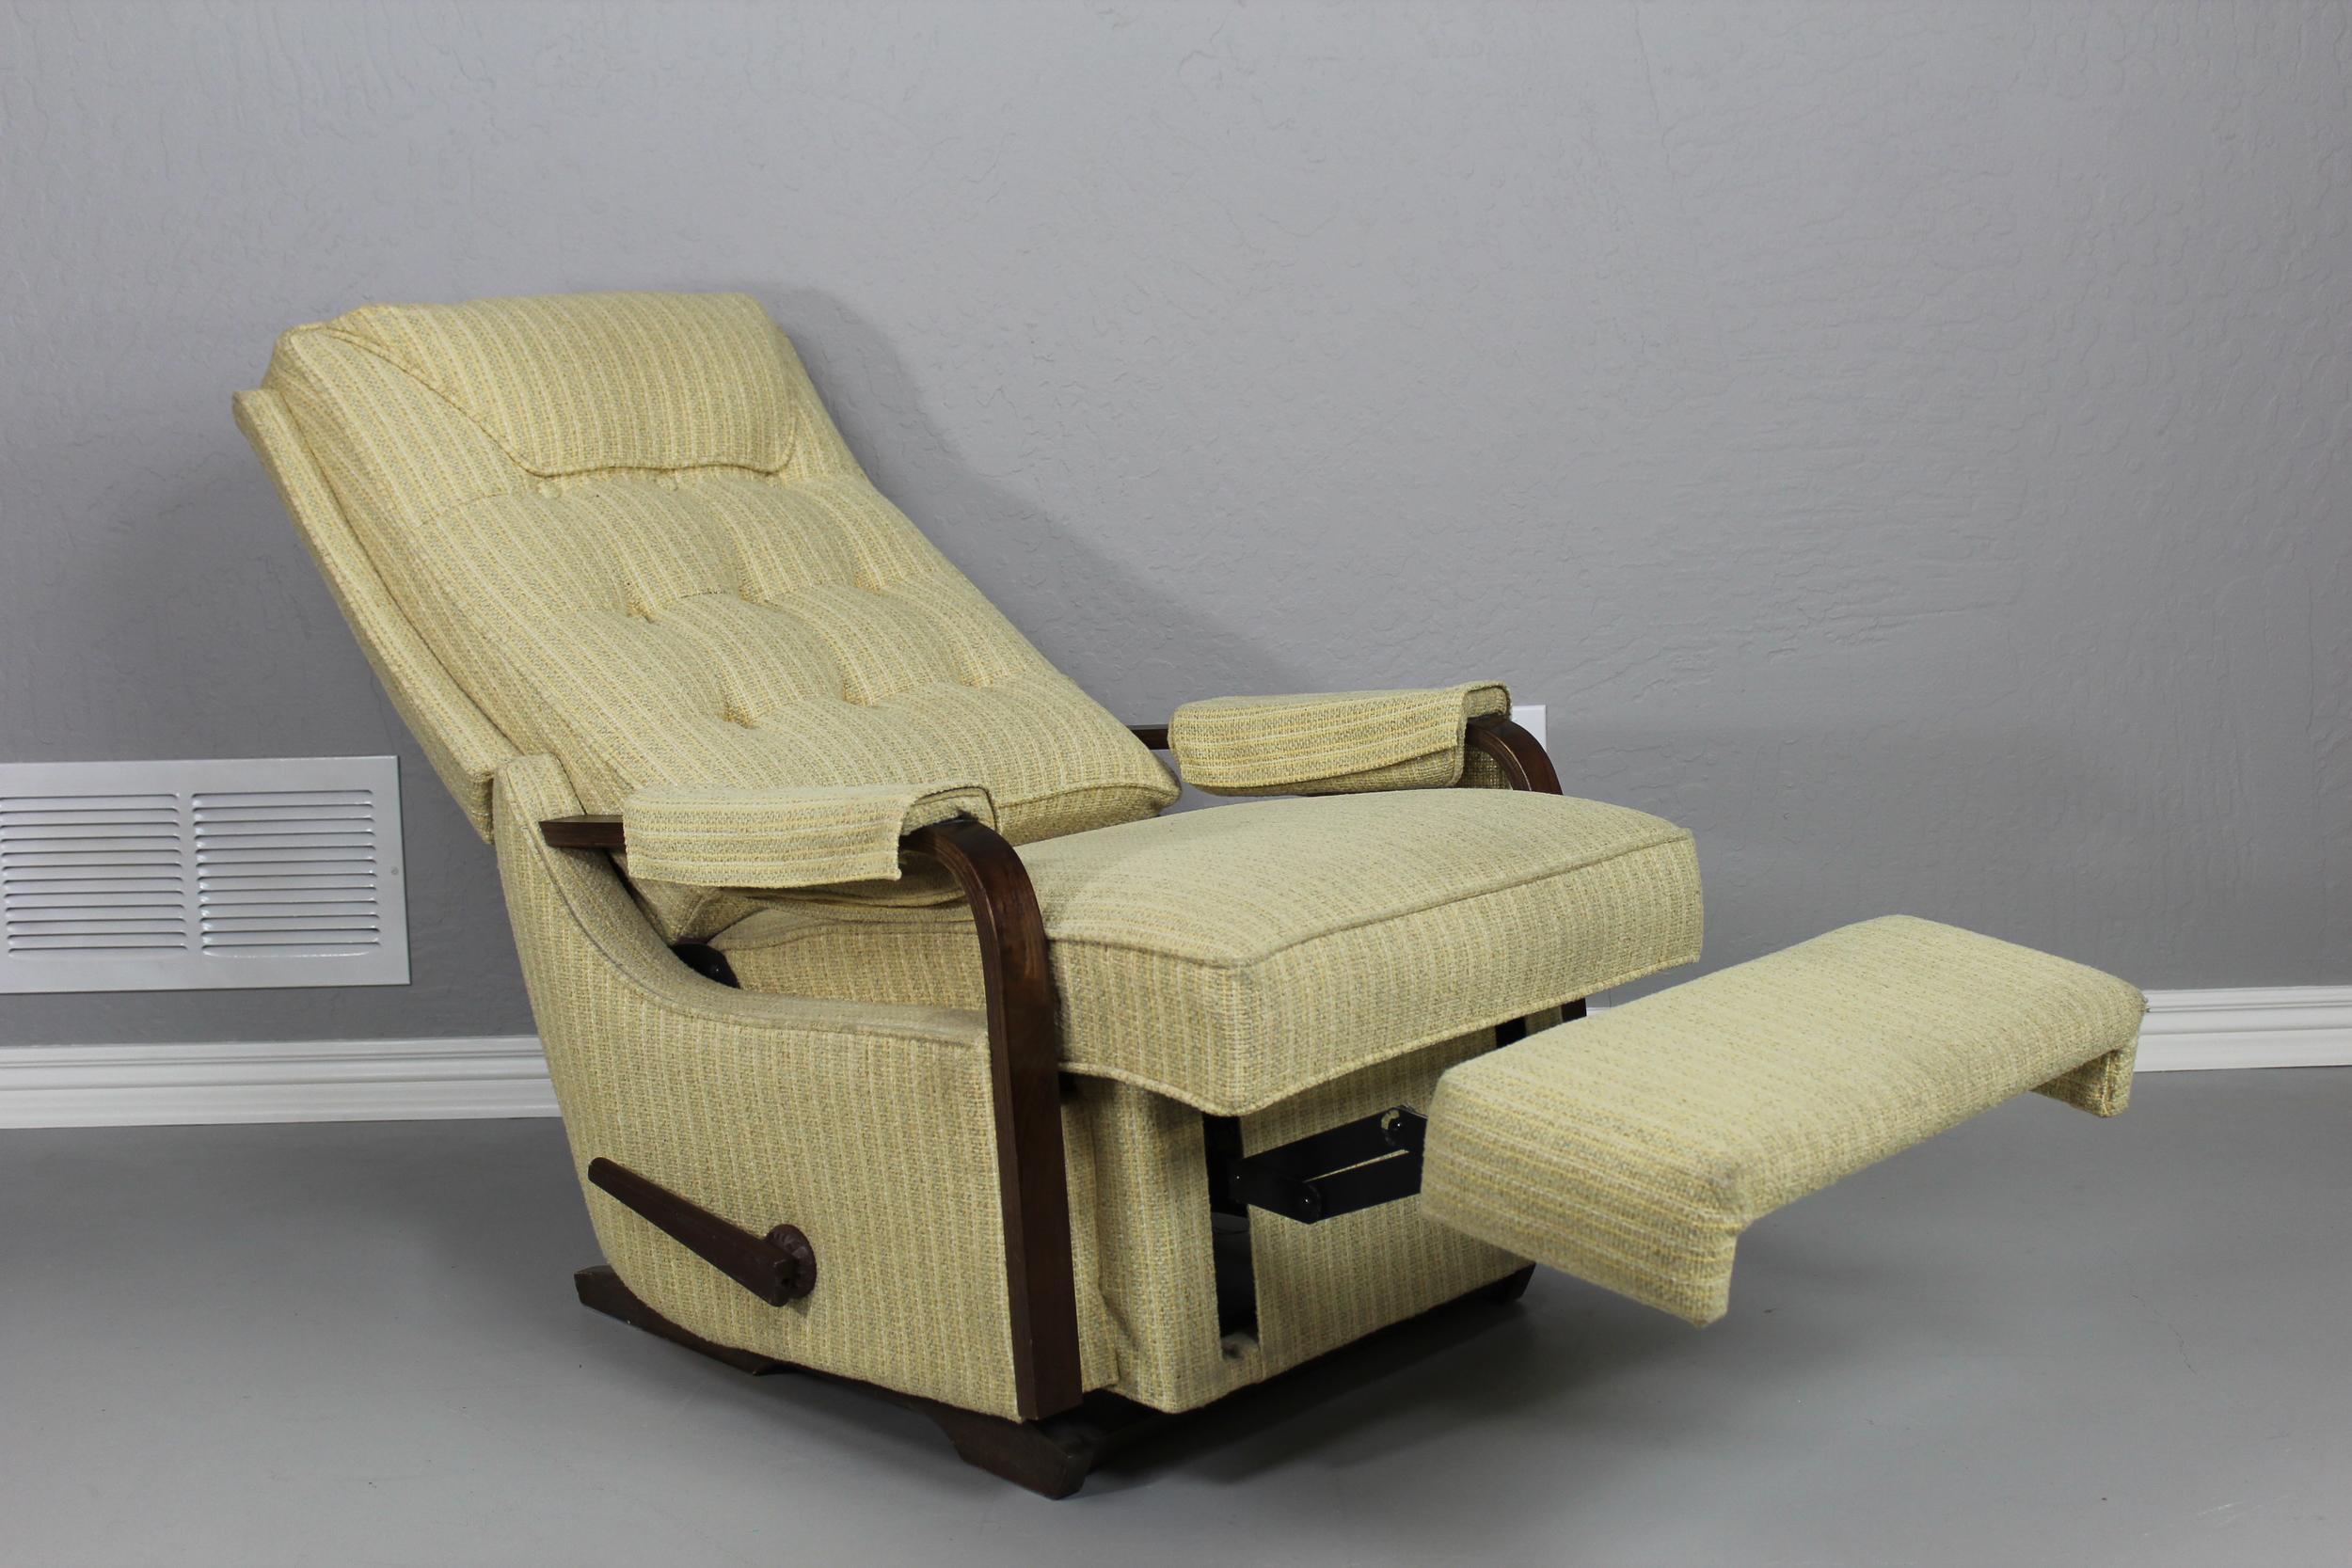 & Vintage La-Z-Boy Recliner u2014 Mid Century Modern Unique islam-shia.org